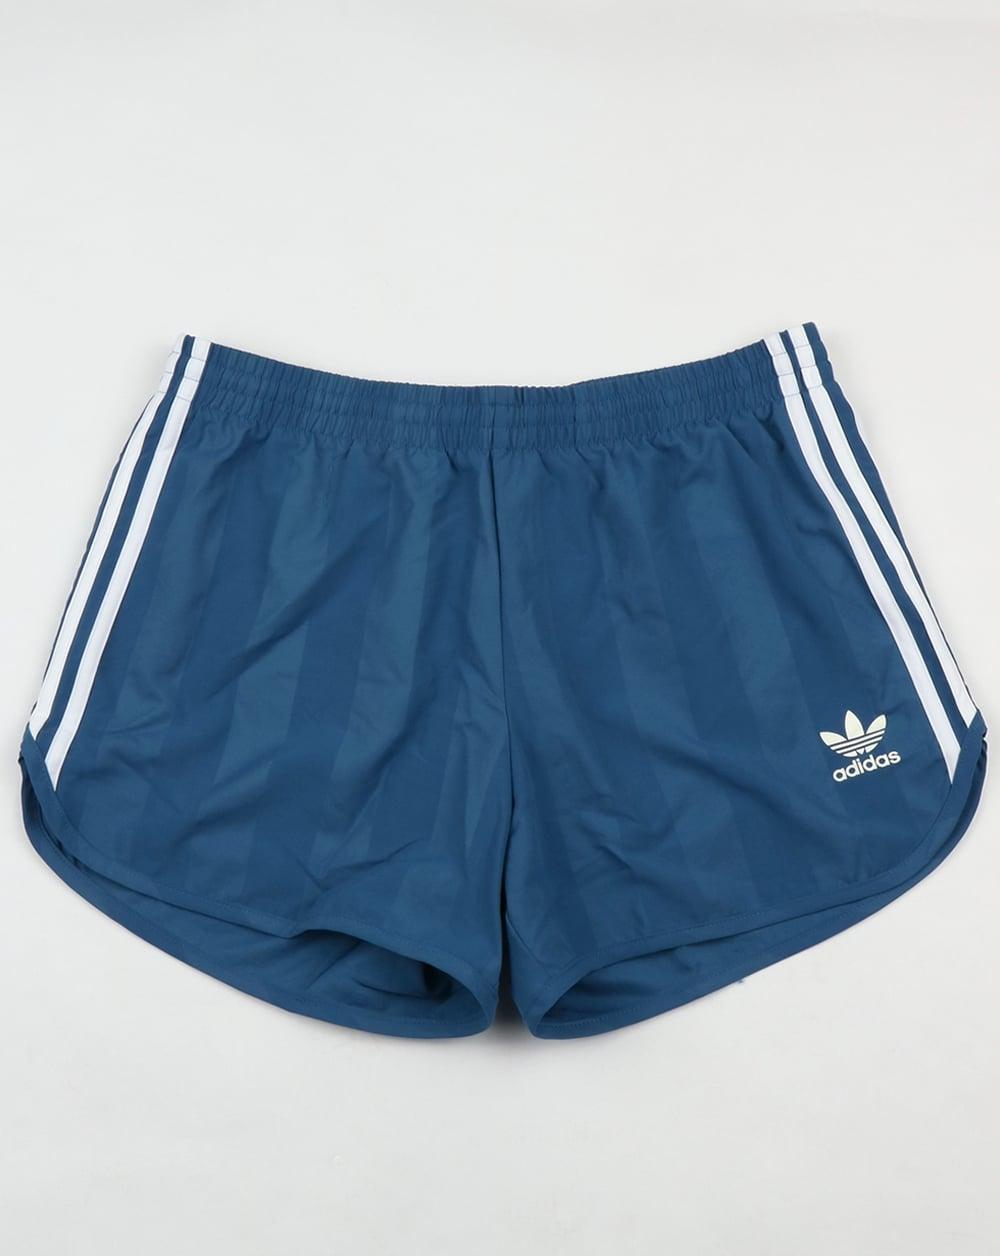 Cobertizo callejón espada  Adidas Originals Football Shorts Core Blue,retro,shiny,polyester,mens